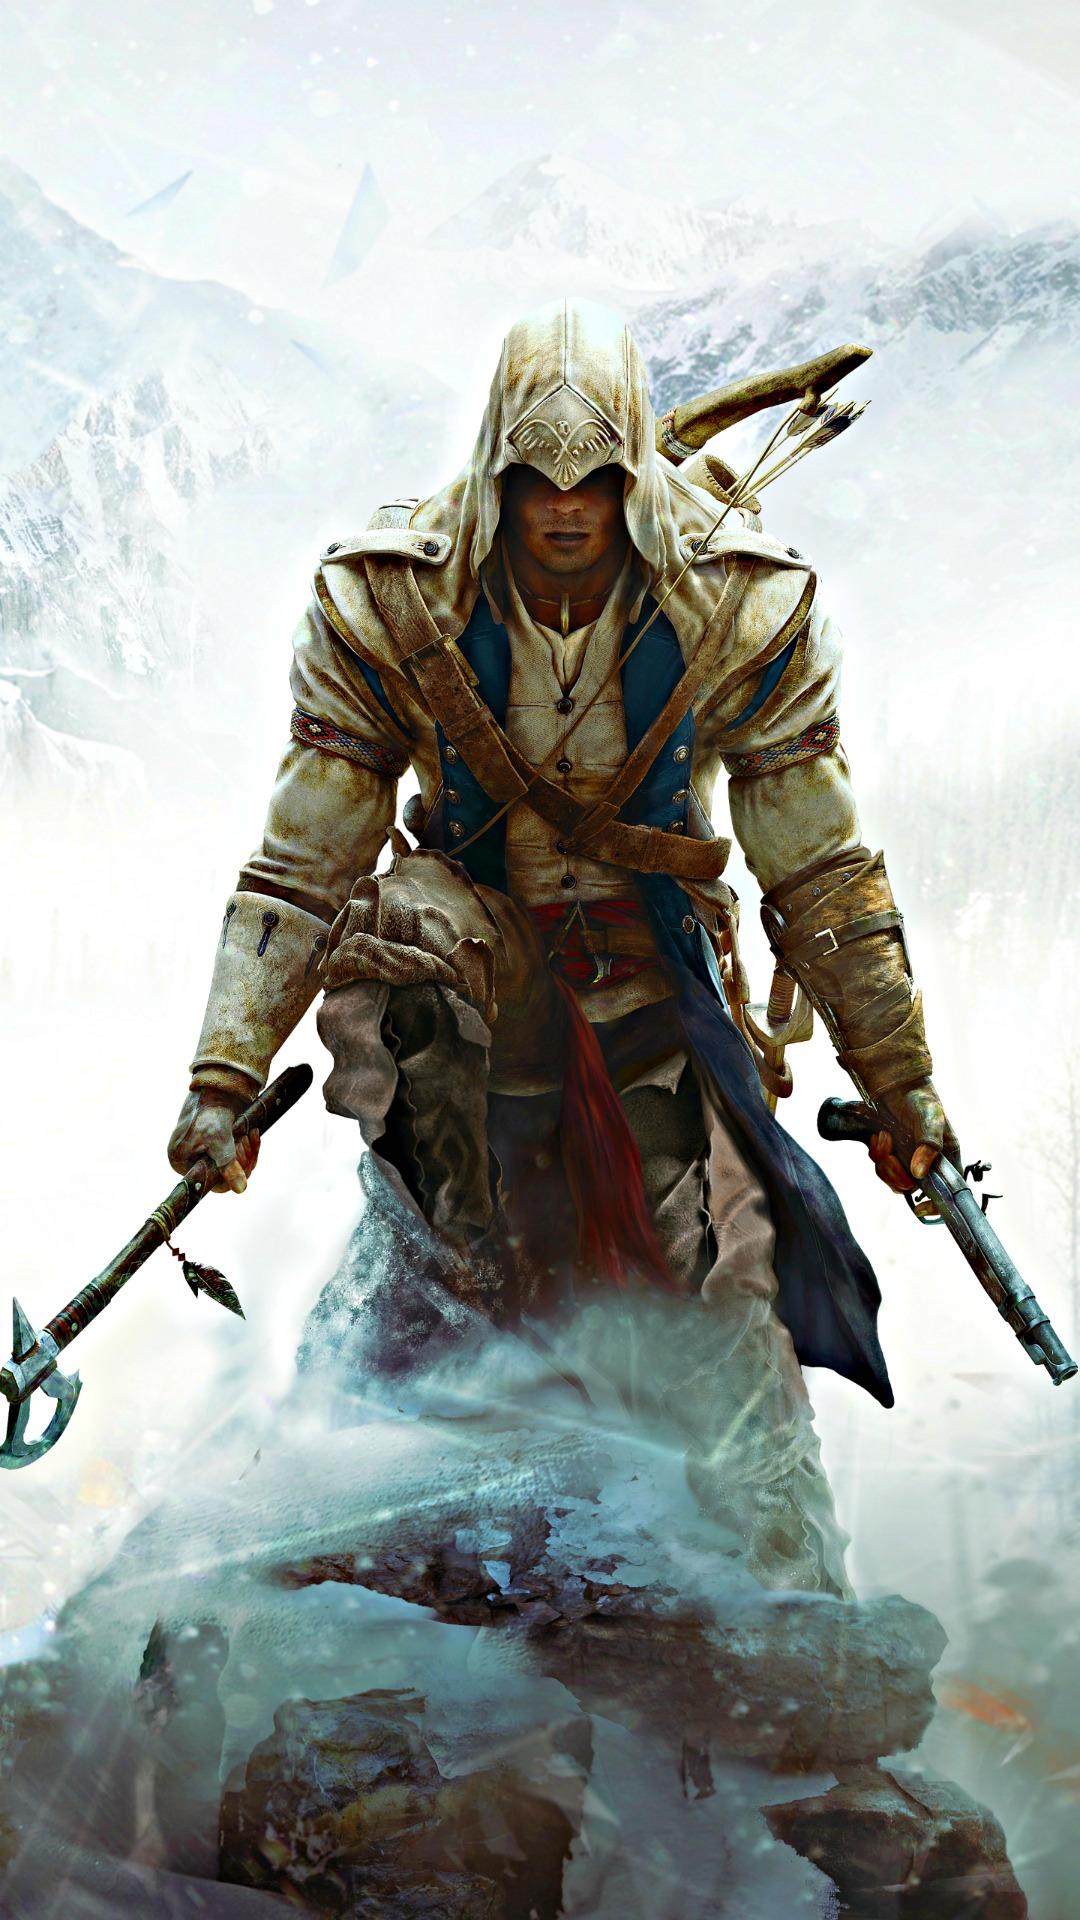 Free Download Assassins Creed 3 Wallpaper Hd Desktop Iphone Tablet